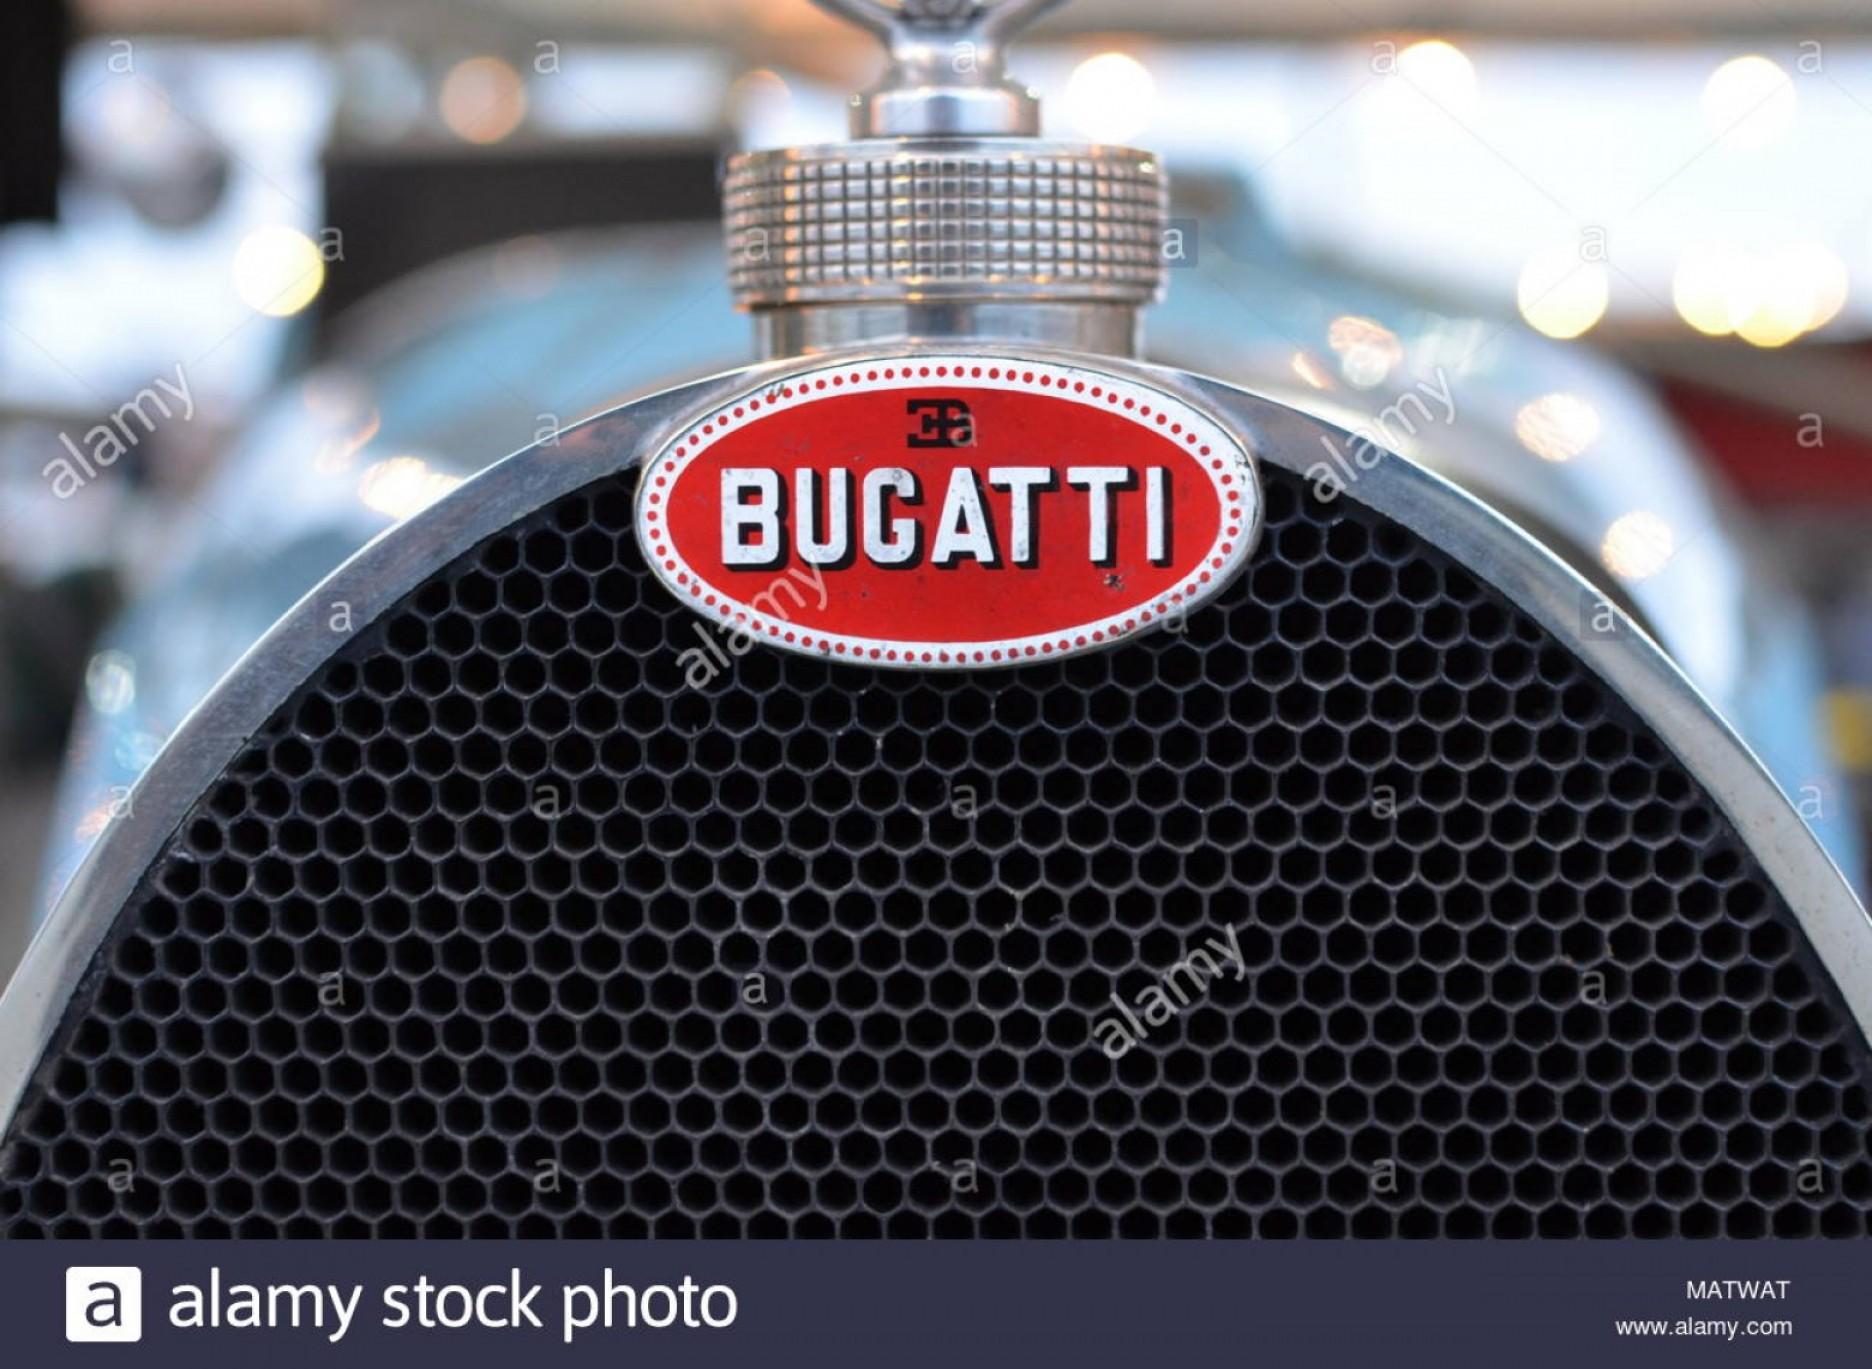 1872x1369 Bugatti Race Car Grill And Mascot Image Arenawp